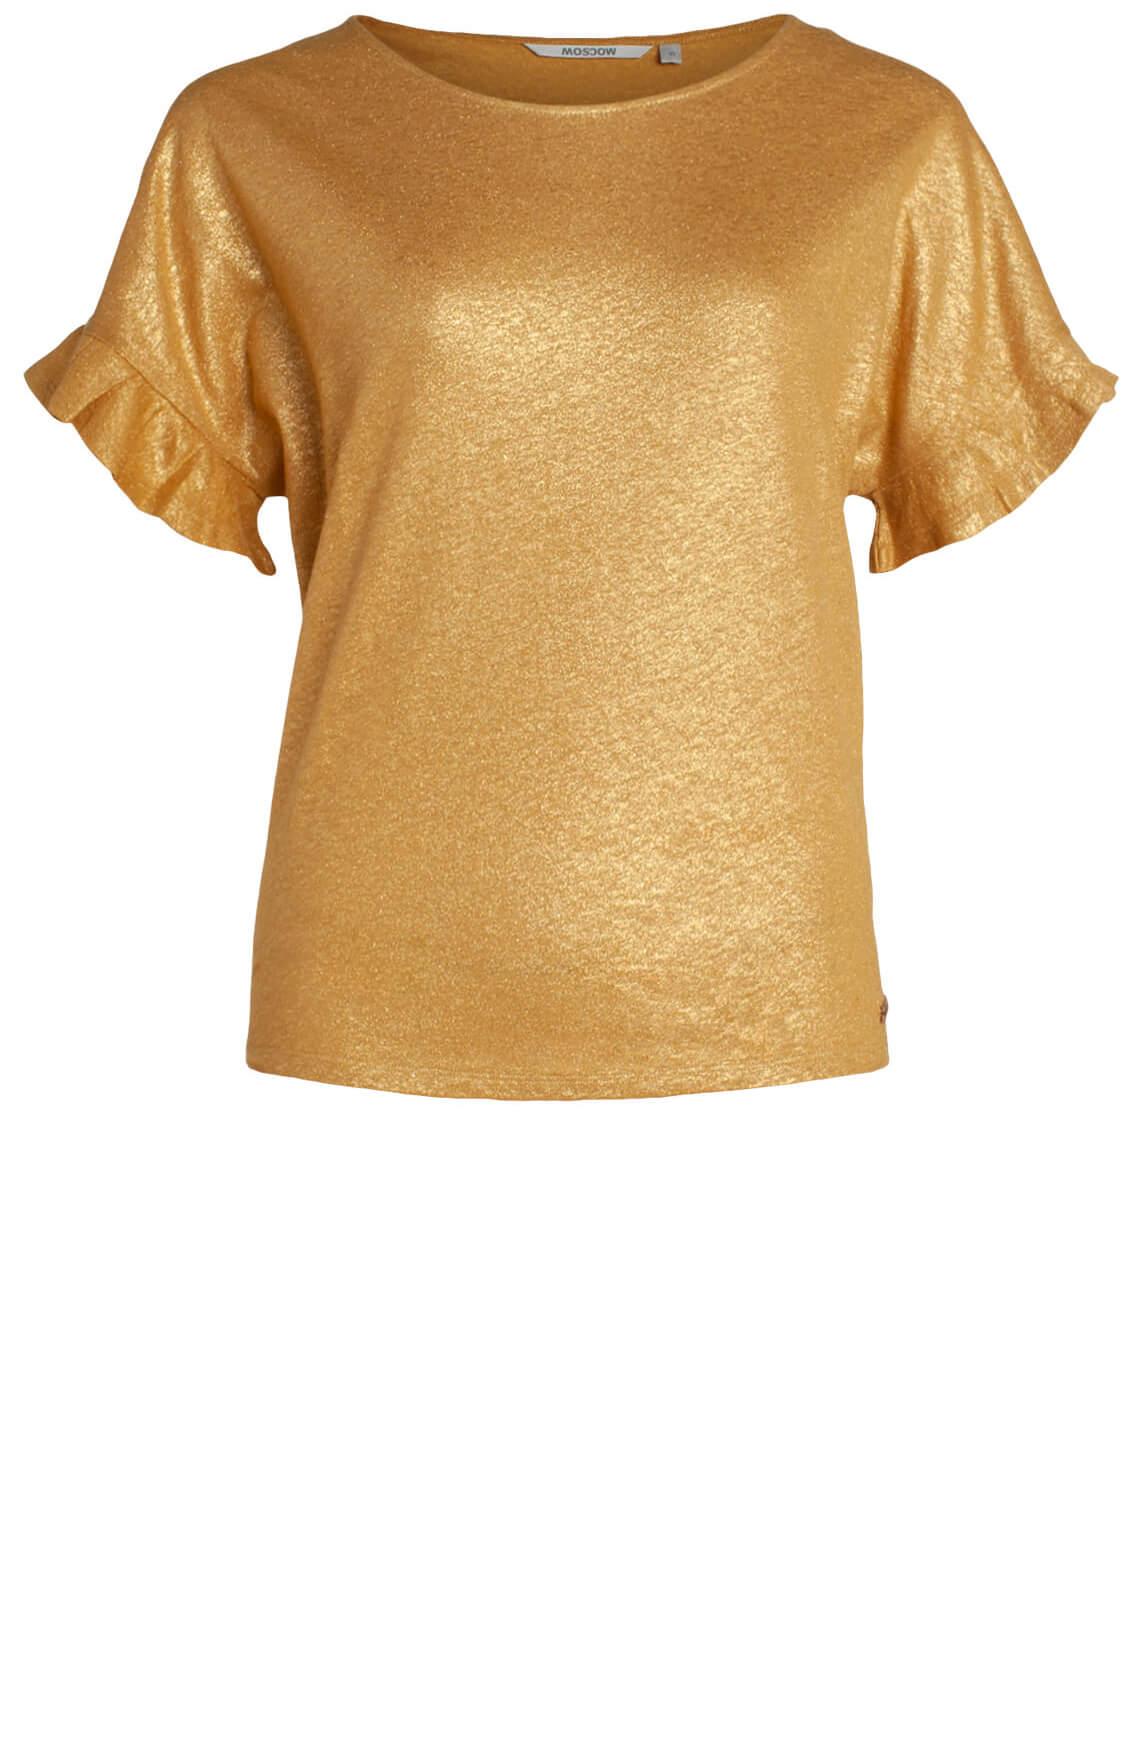 Moscow Dames Shirt met ruffles geel